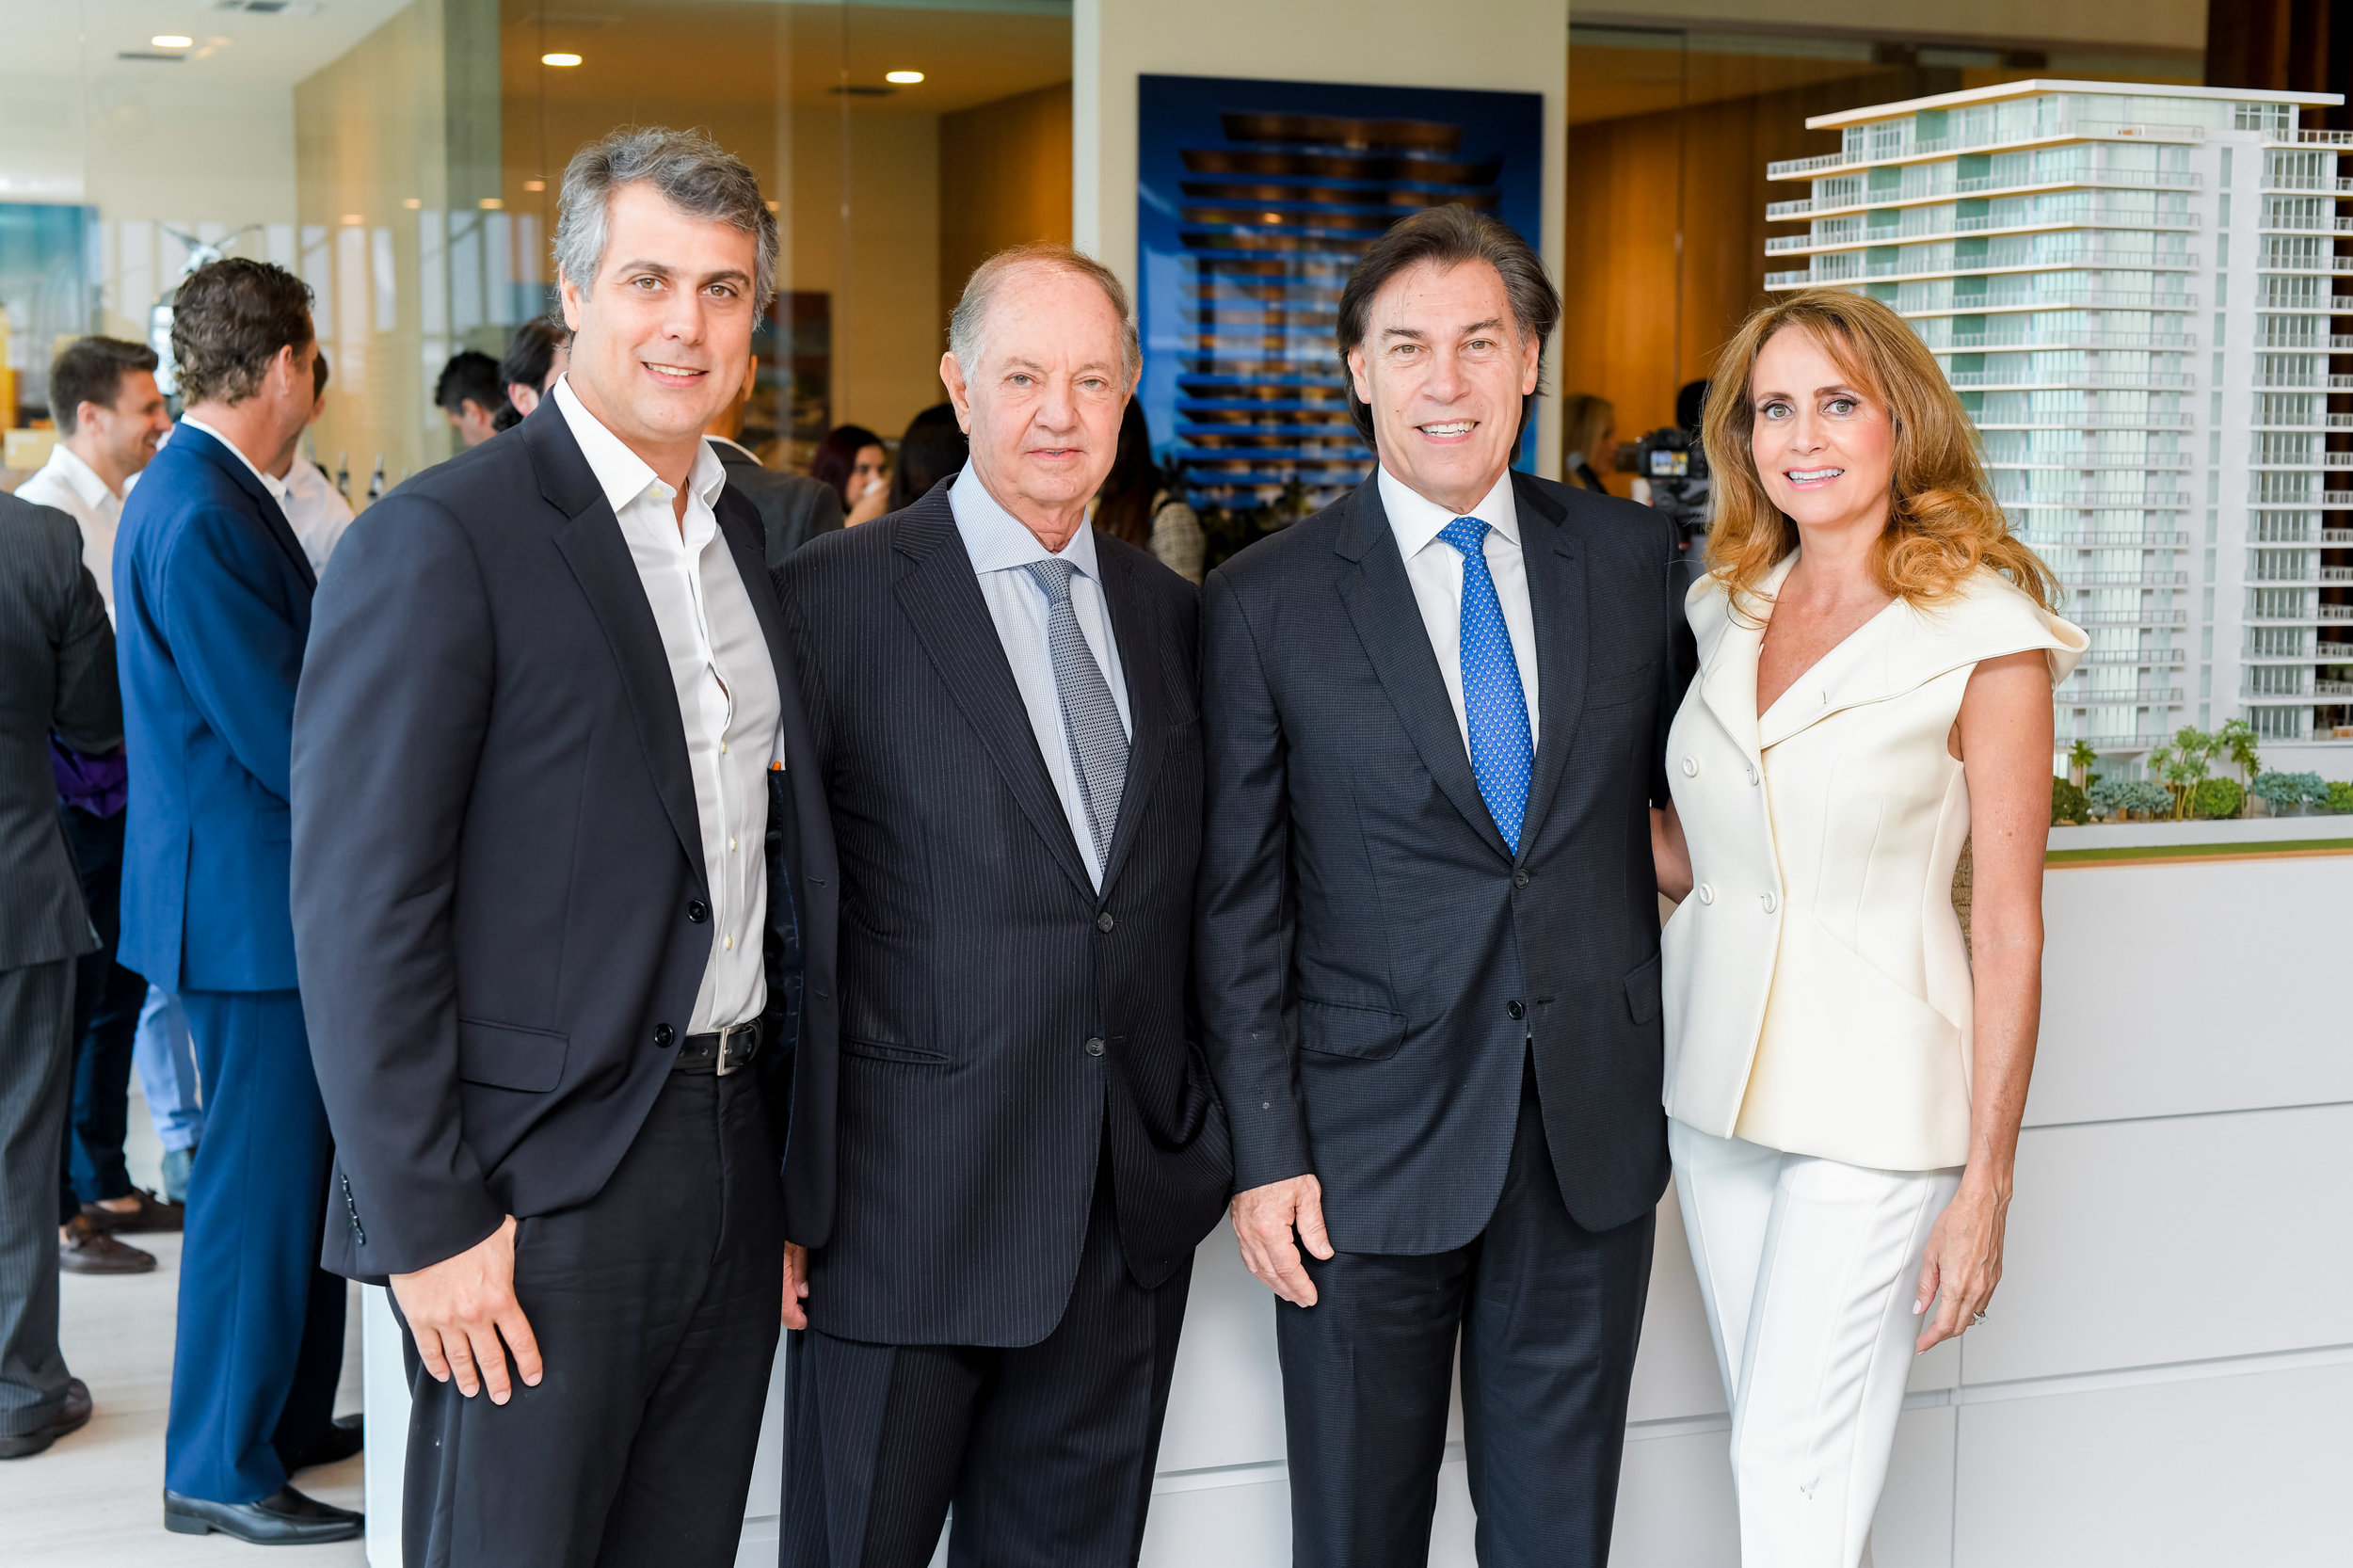 Marcelo Kingston, Dr. José Isaac Peres, Edgardo Defortuna, and Ana Cristina Defortuna